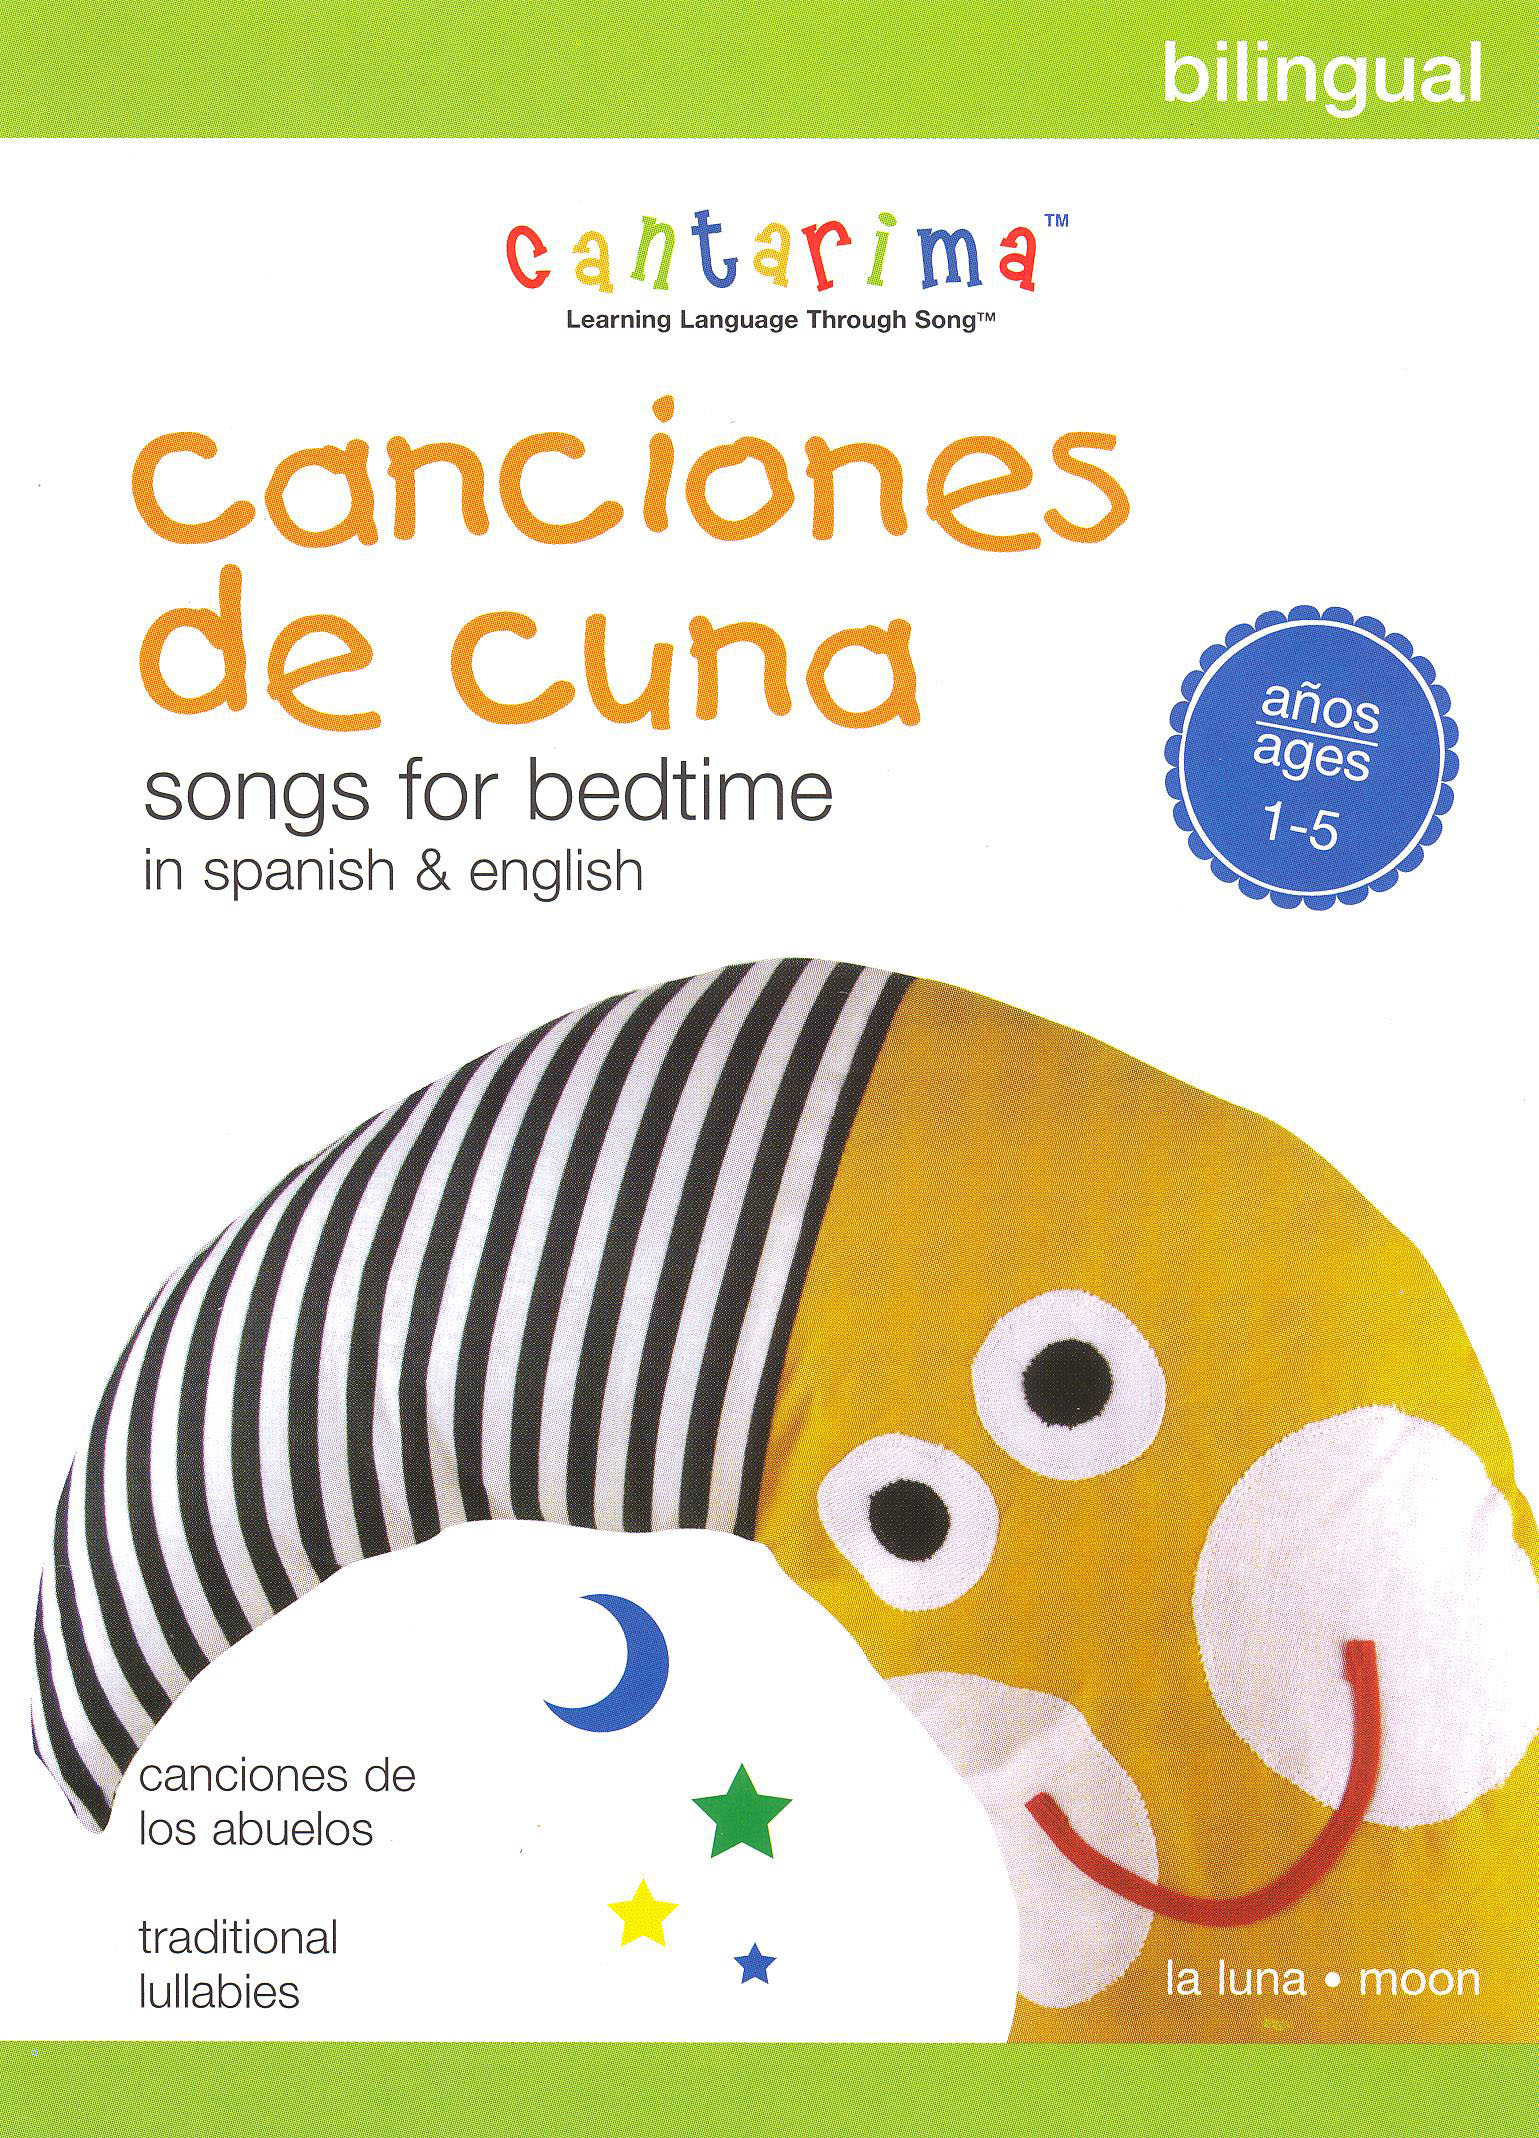 Cantarima: Canciones de Cuna